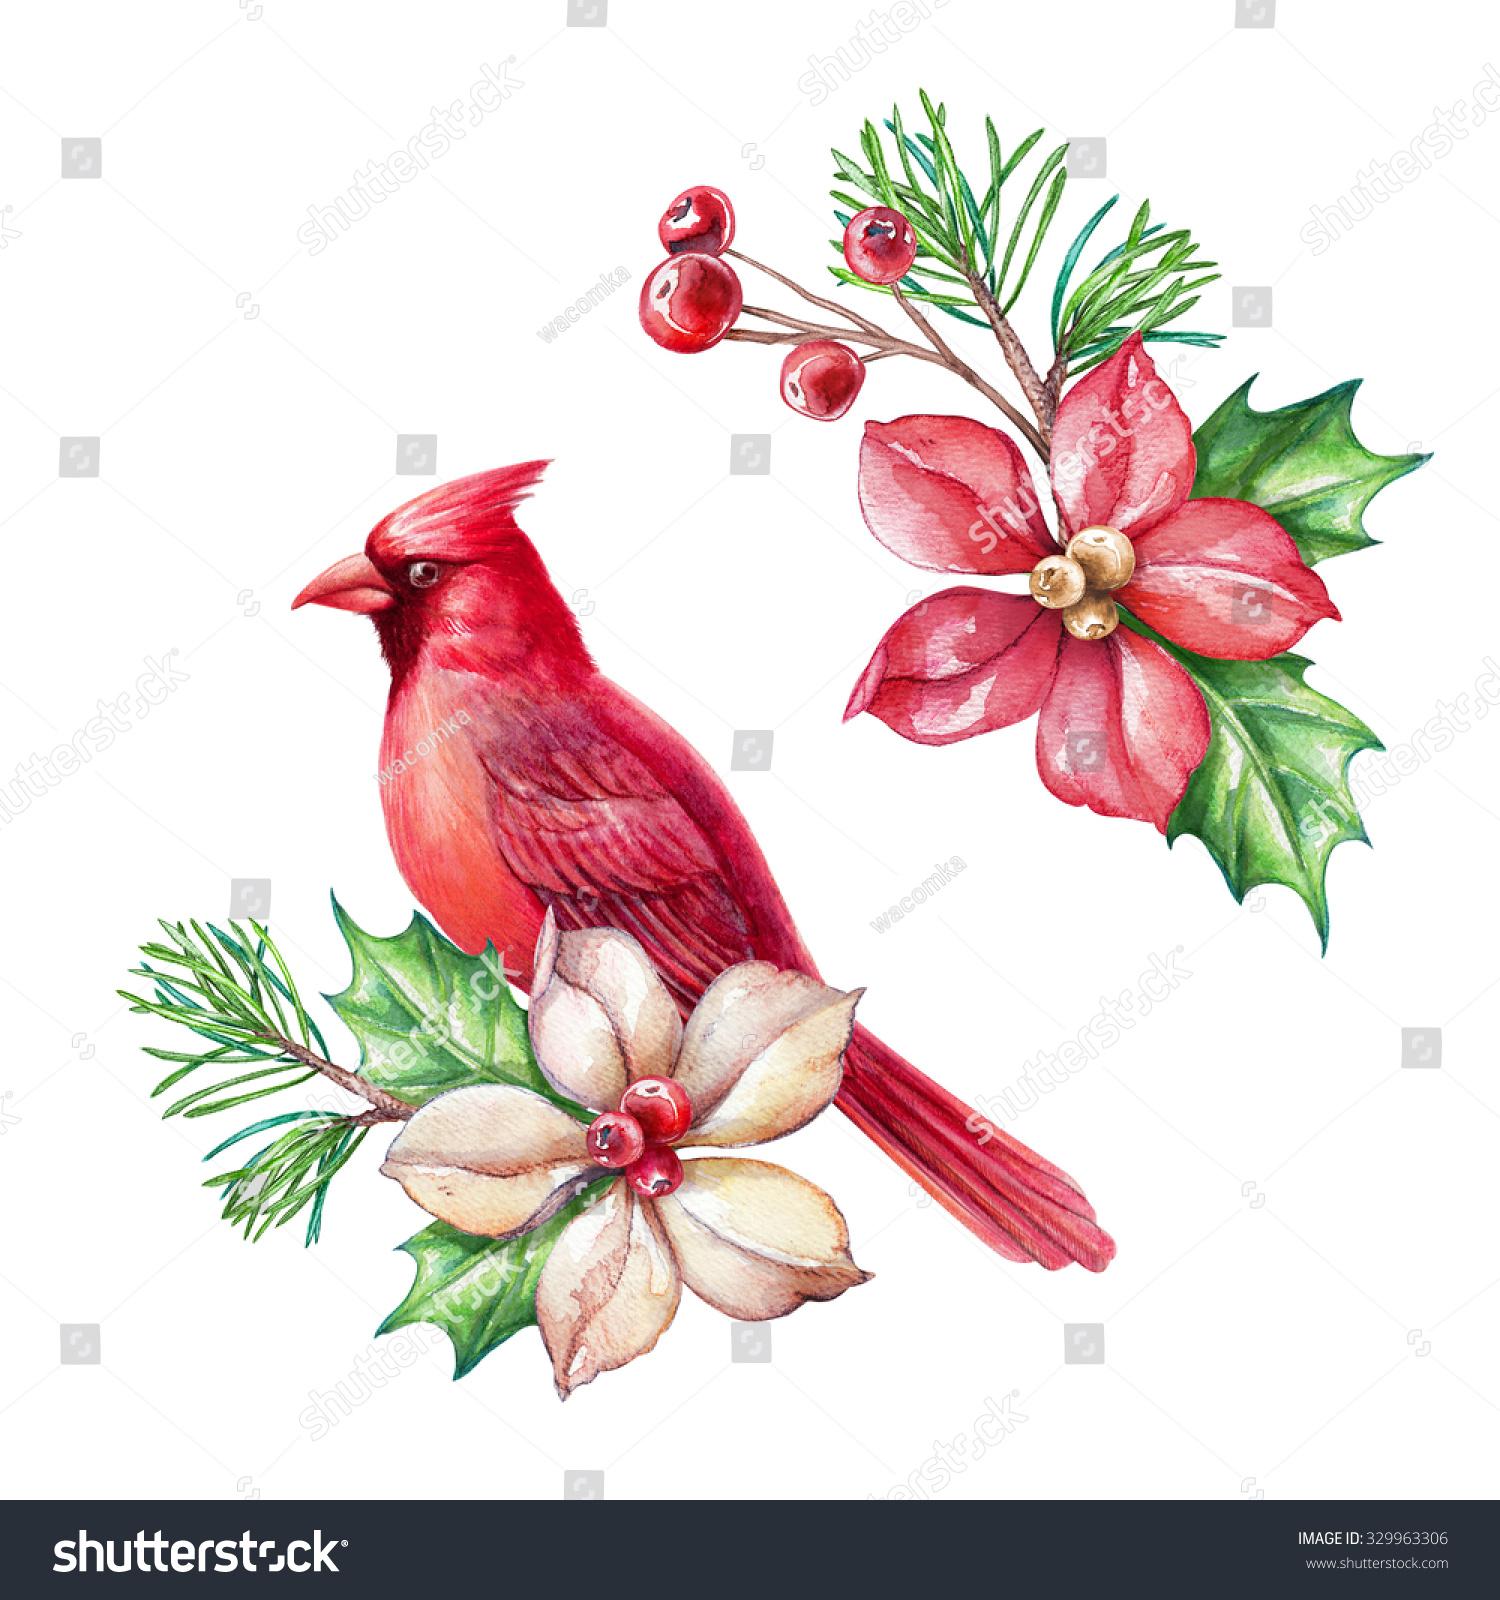 Red Bird Poinsettia Flower Christmas Holiday Stock ...